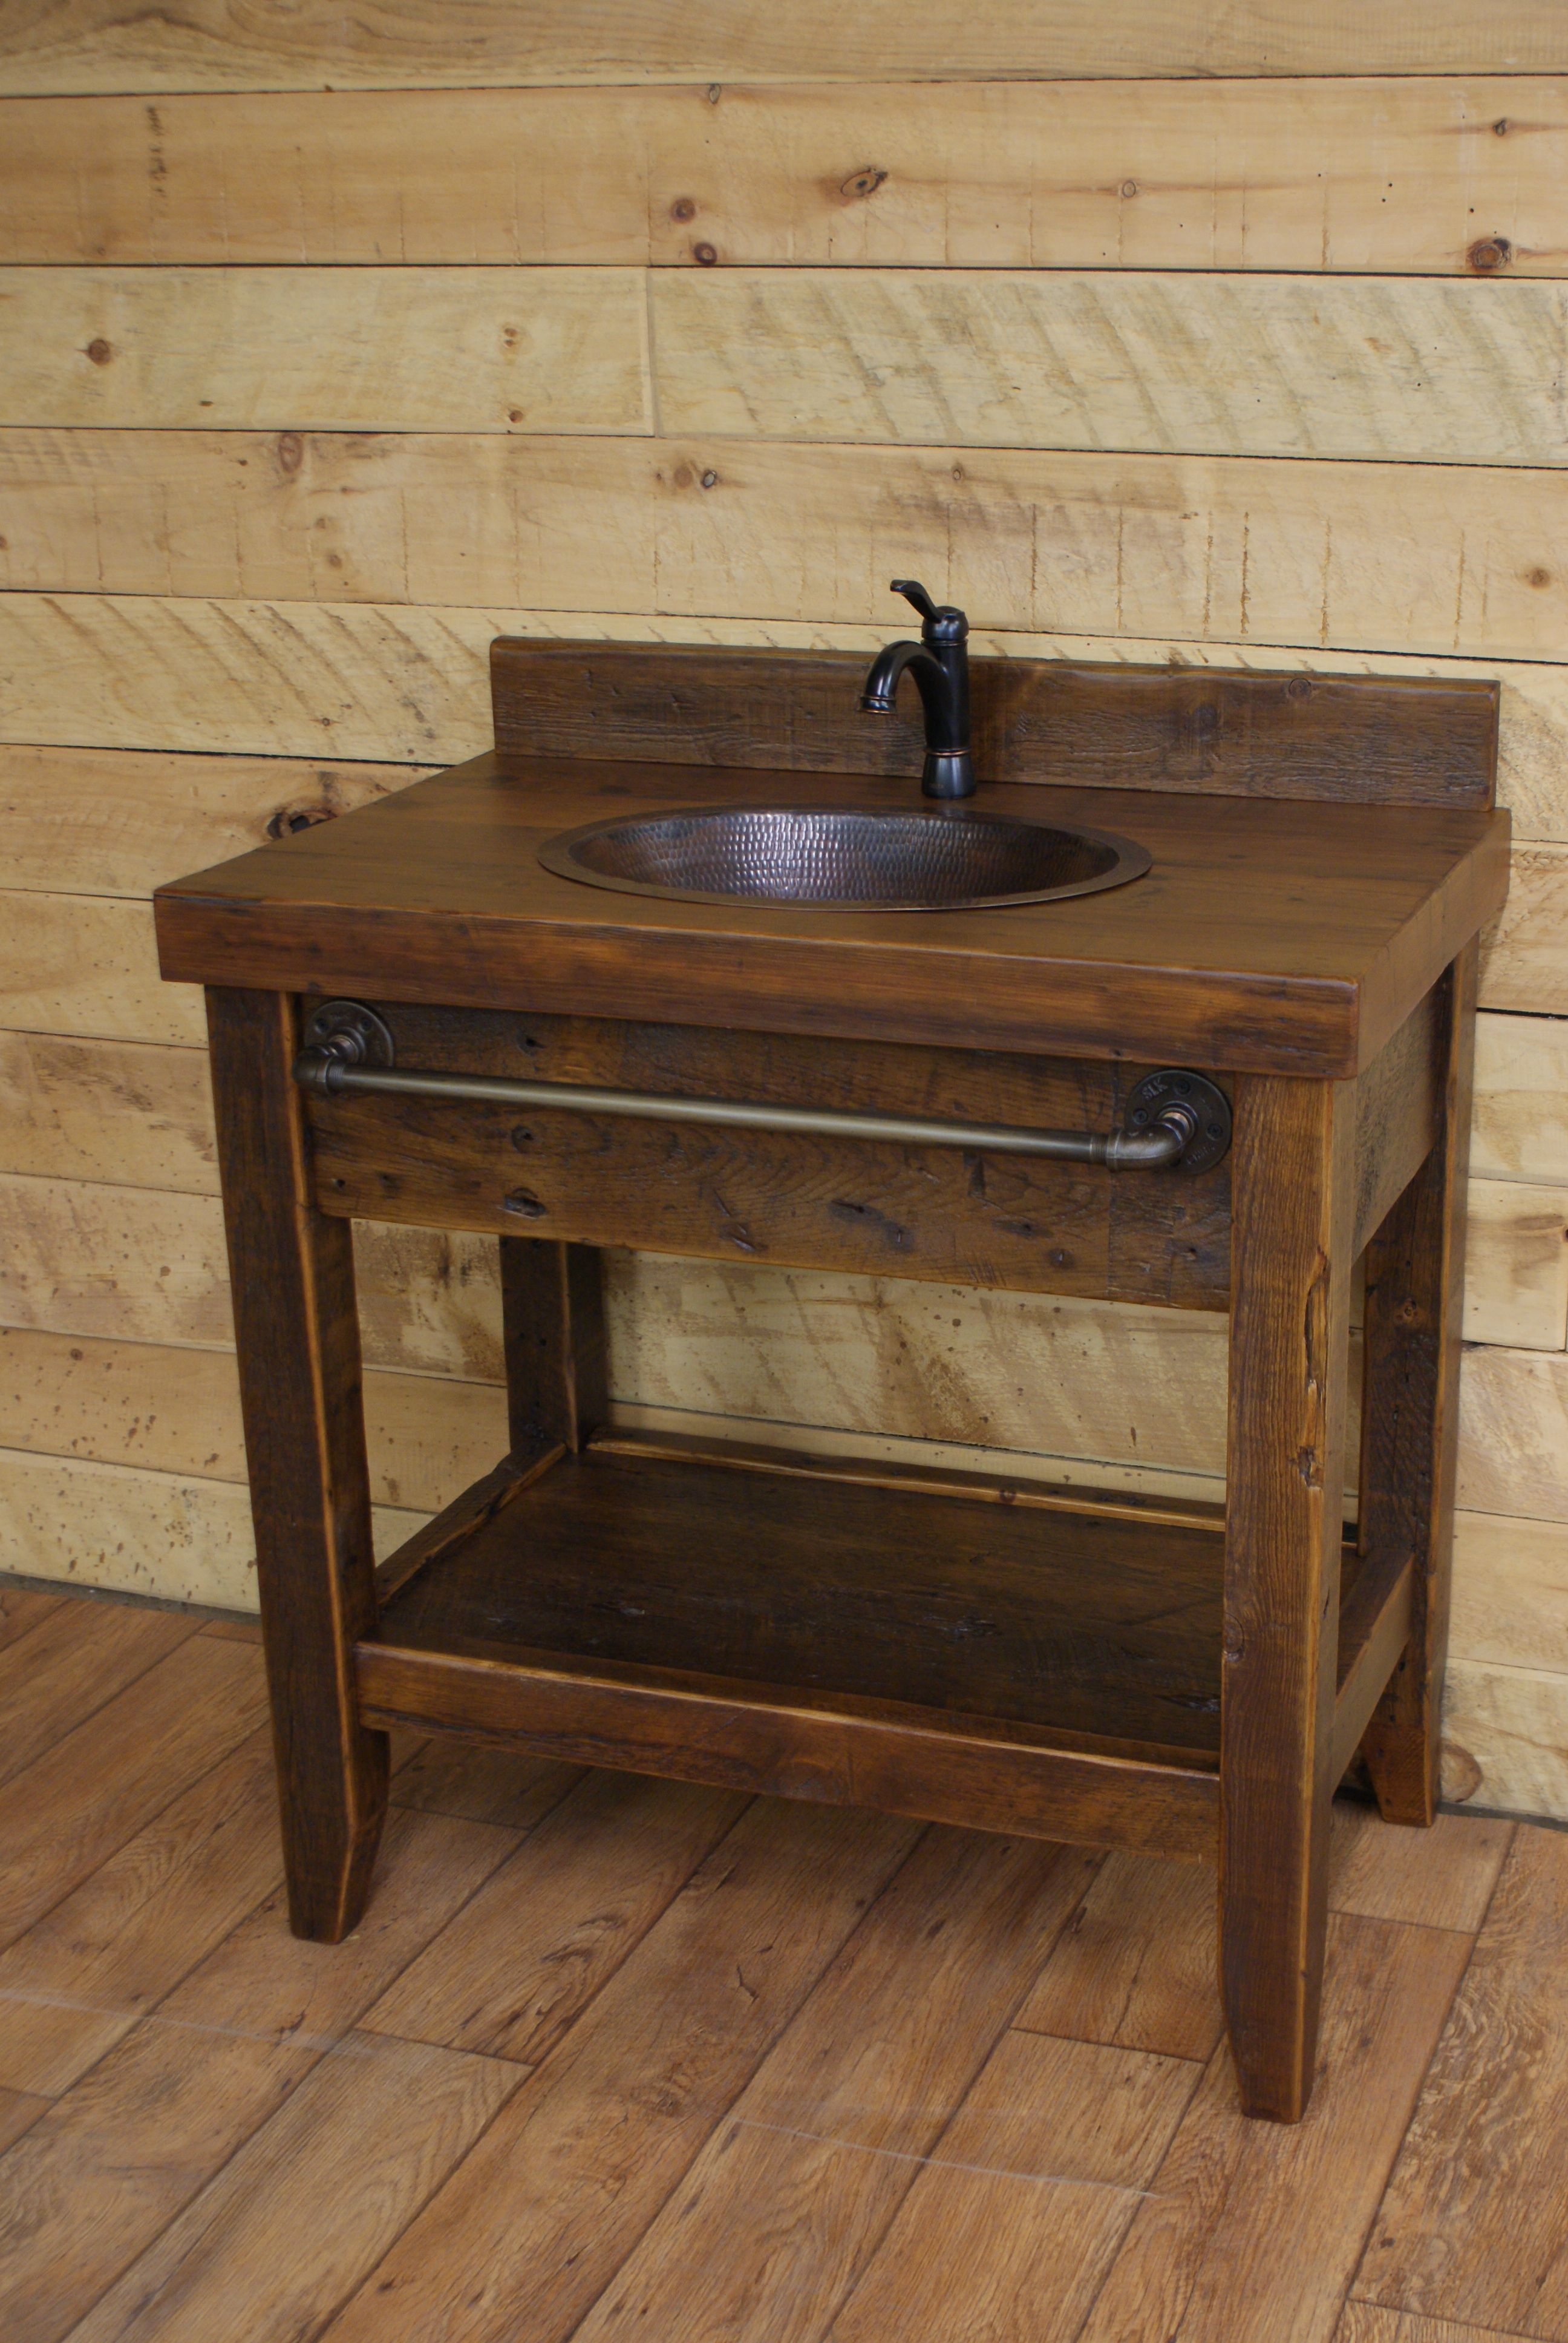 Rustic Style Ideas With Rustic Bathroom Vanities Tags Reclaimed Wood Bathroo Vanites De Salle De Bain Rustique Dessins De Bains Rustiques Vanite Salle De Bain